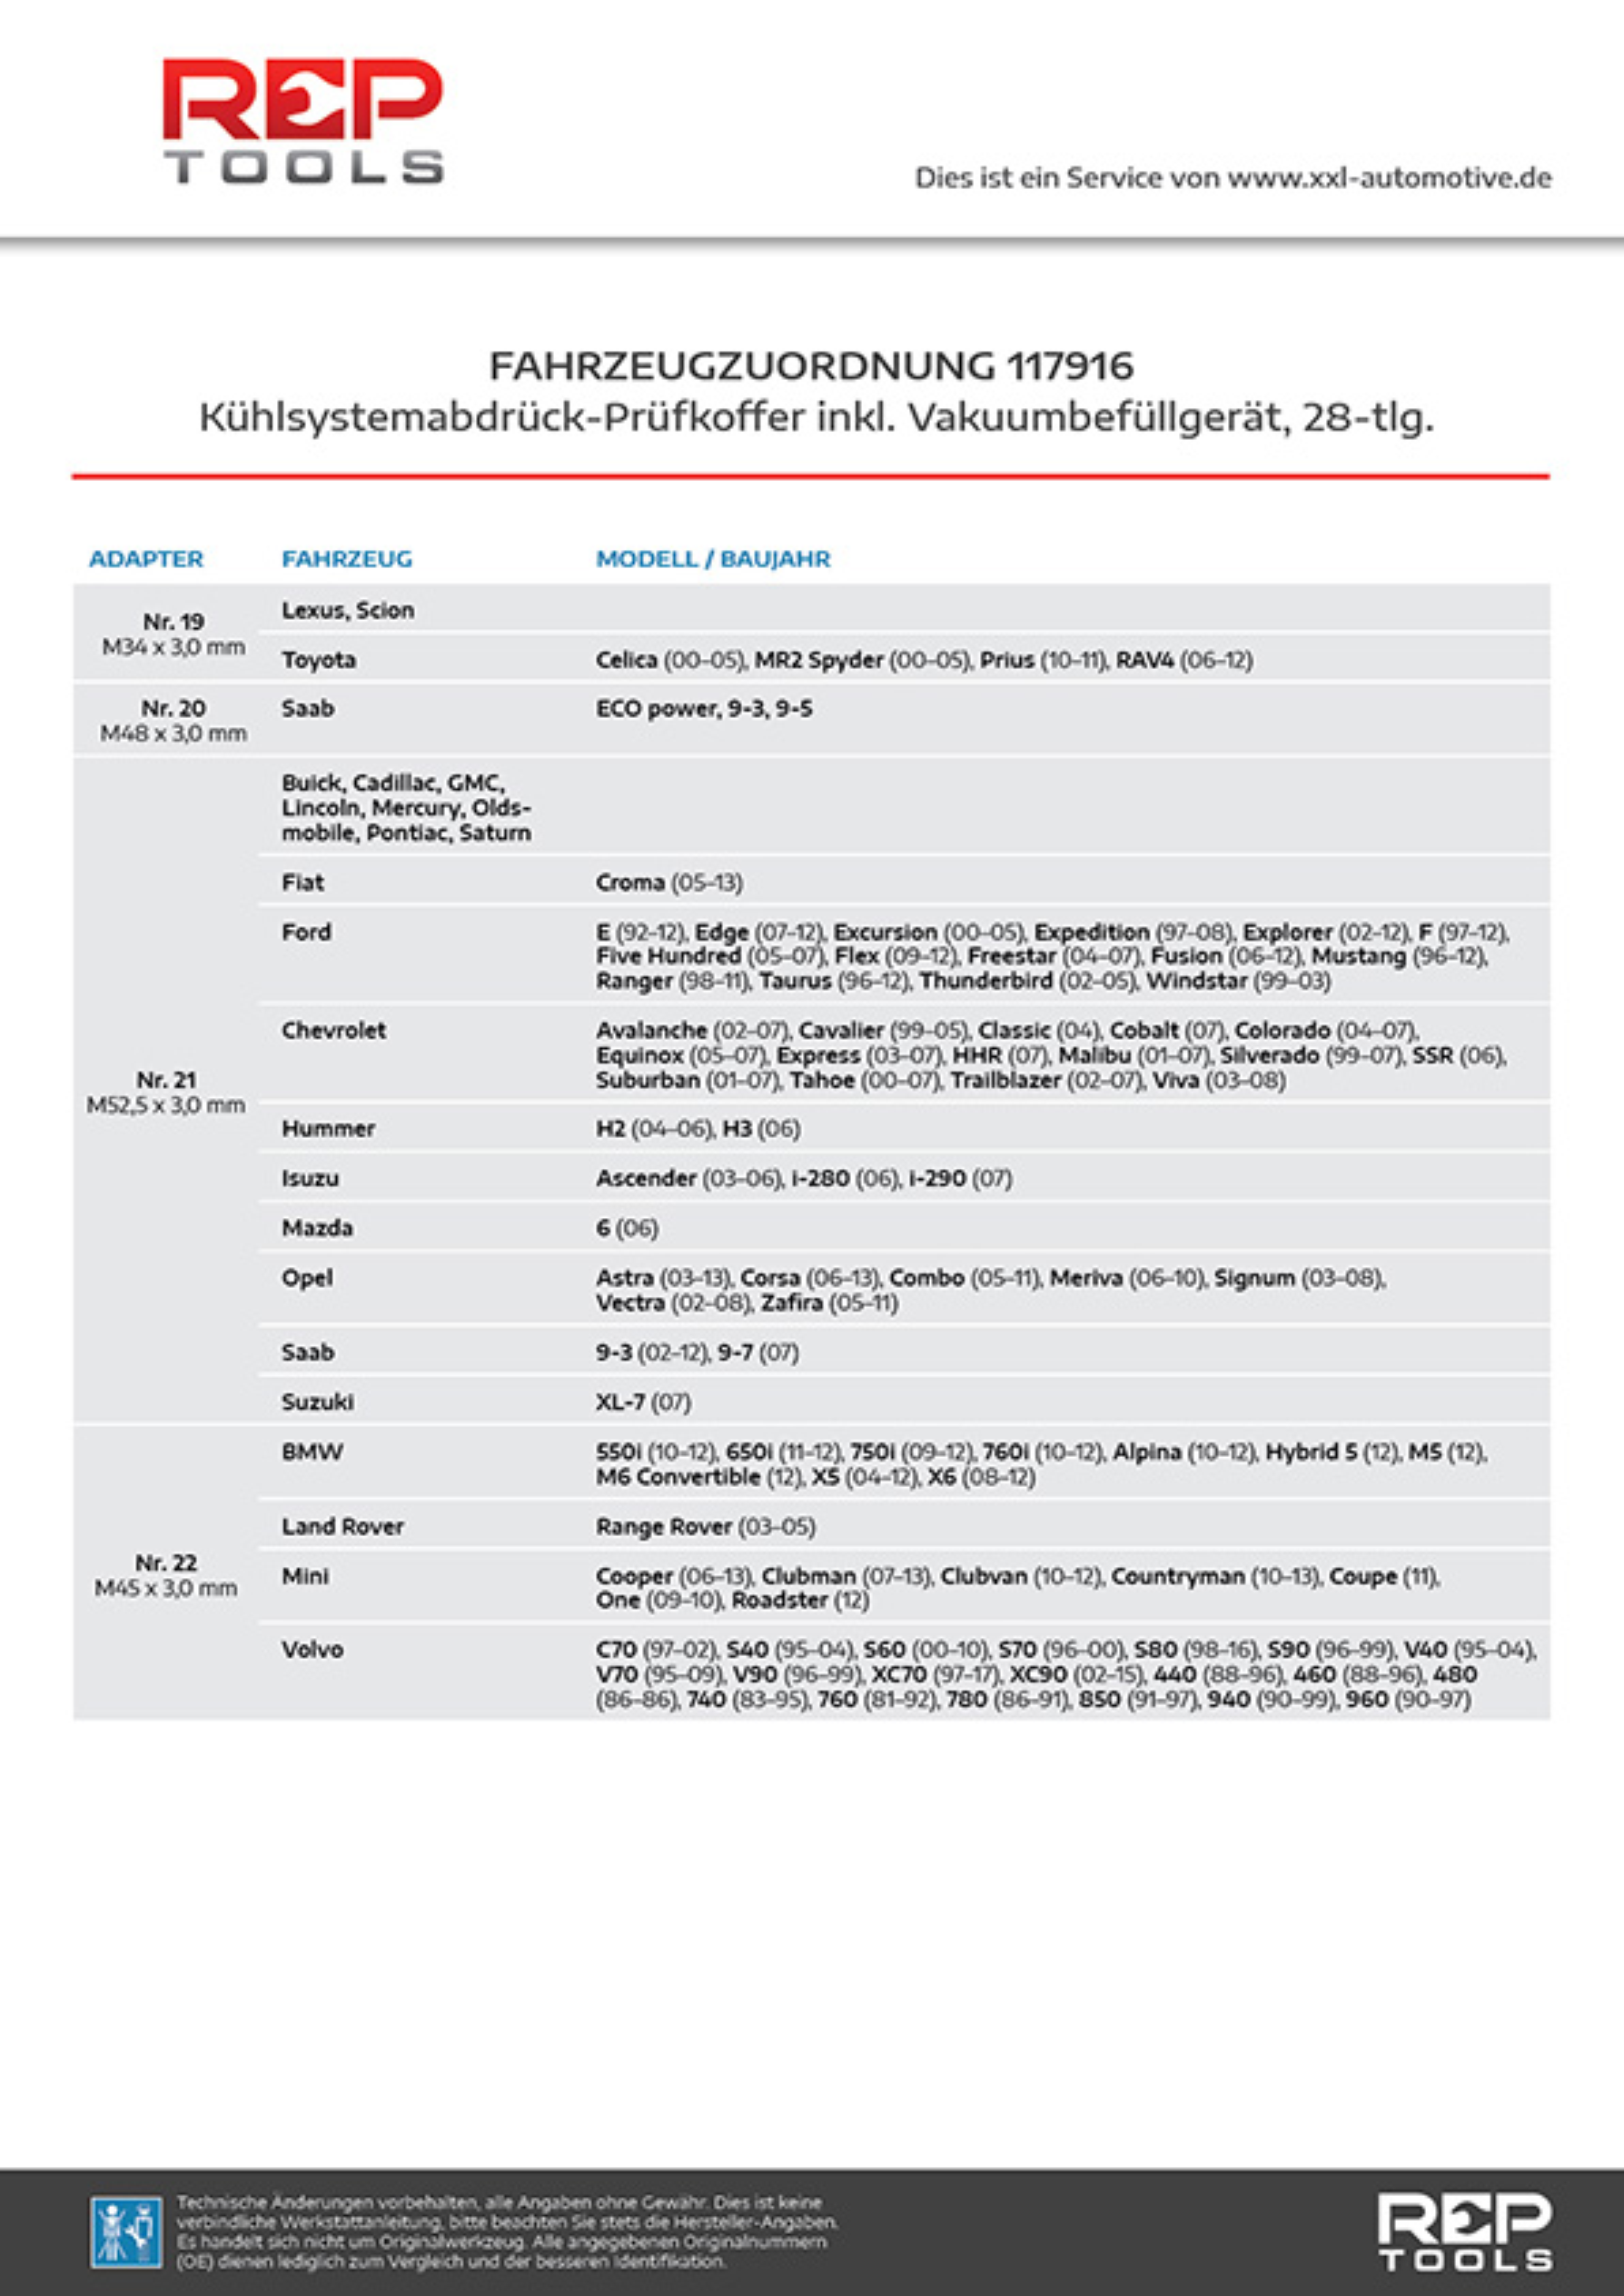 Fahrzeugzuordnung Kühlsystemabdrück-Prüfkoffer inklusive Vakuumbefüllgerät